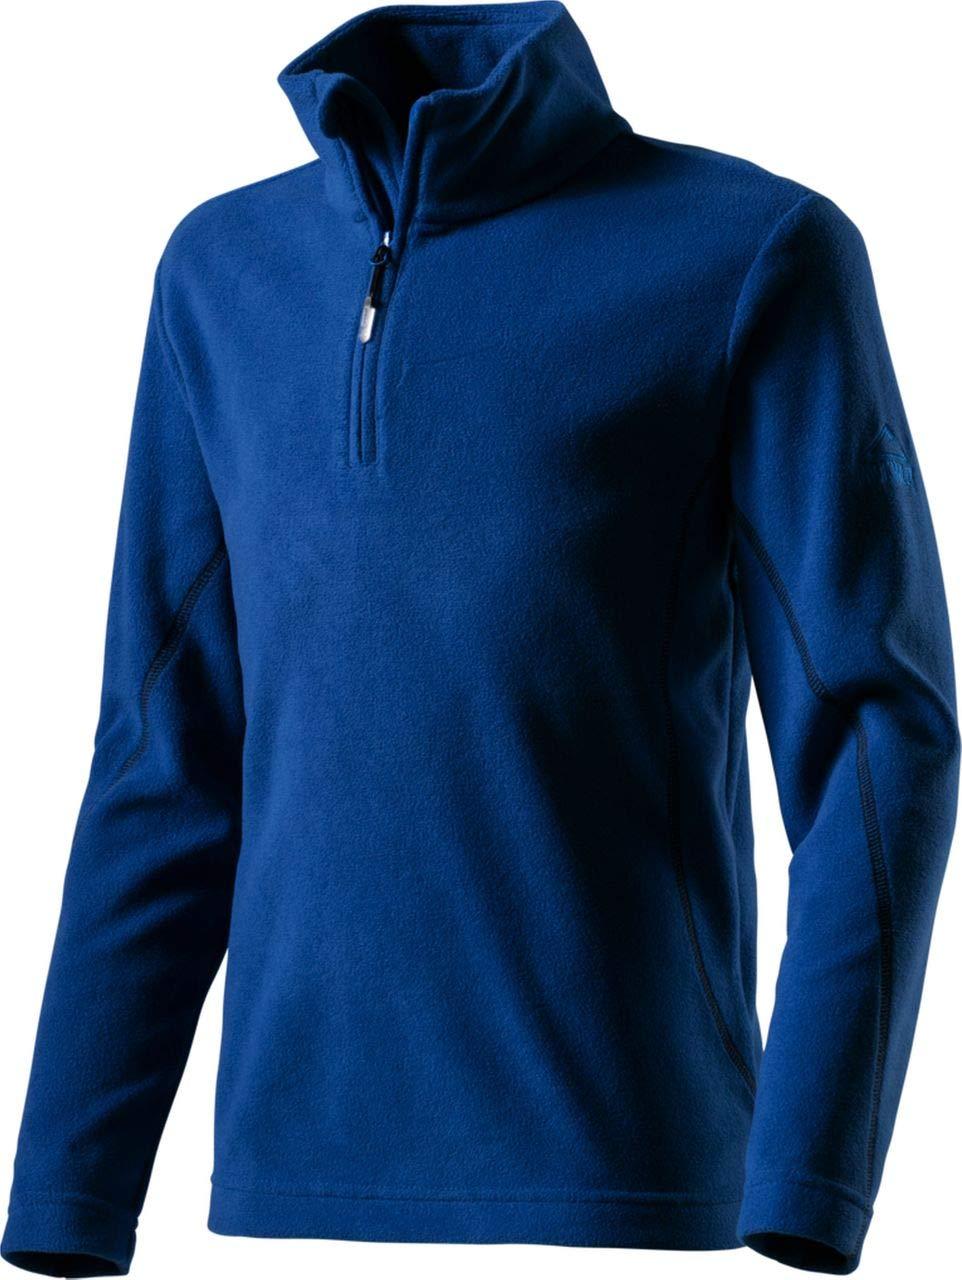 McKINLEY Kinder Malte Fleece-Shirt